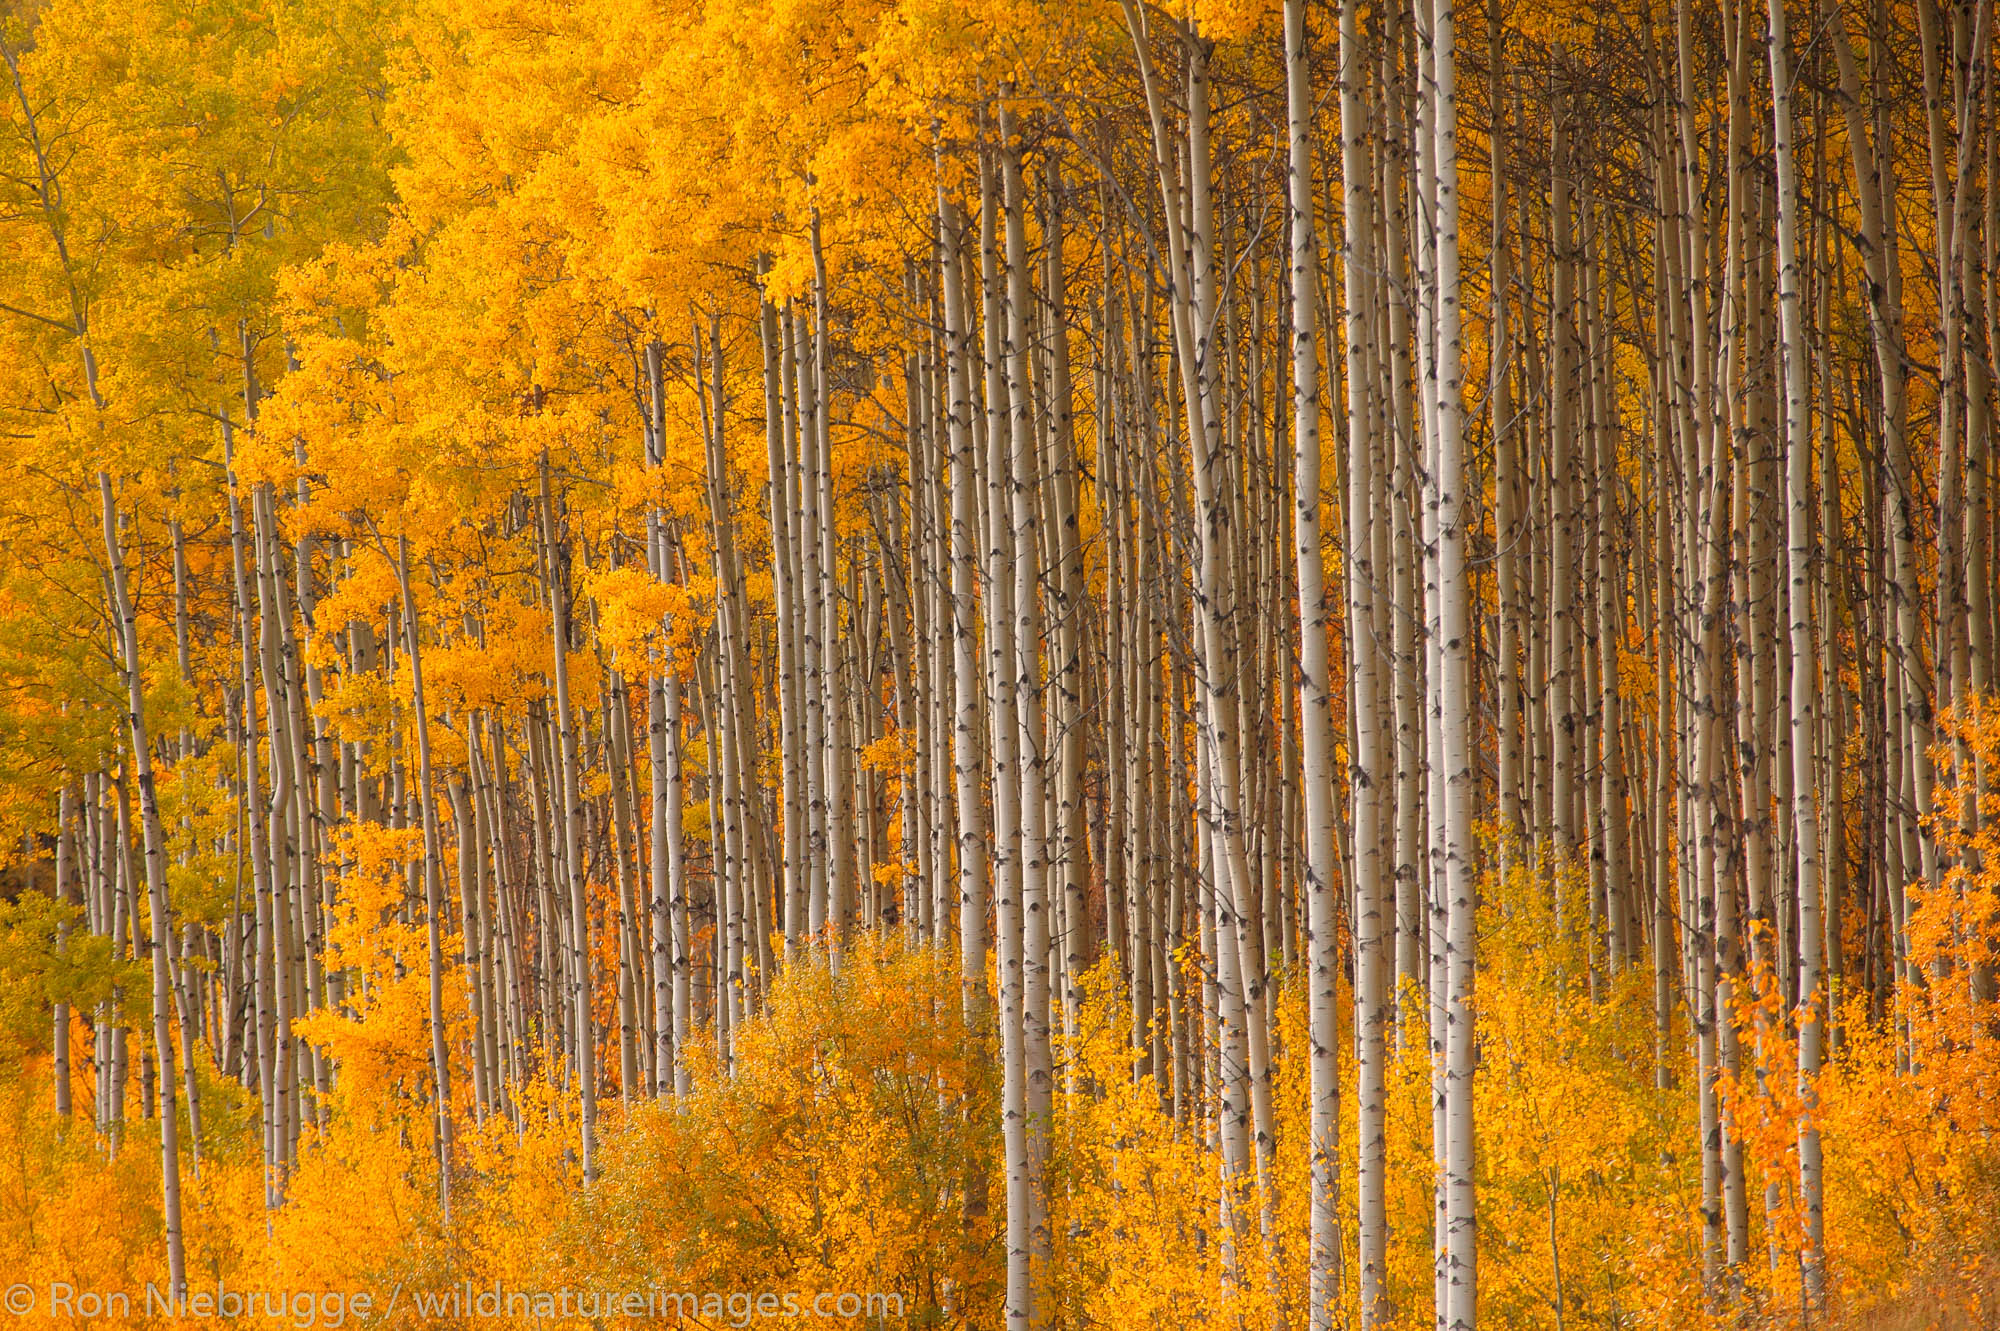 Fall trees (Poplars) near Grand Cache, along the Bighorn Highway Alberta Highway 40, Alberta, Canada.